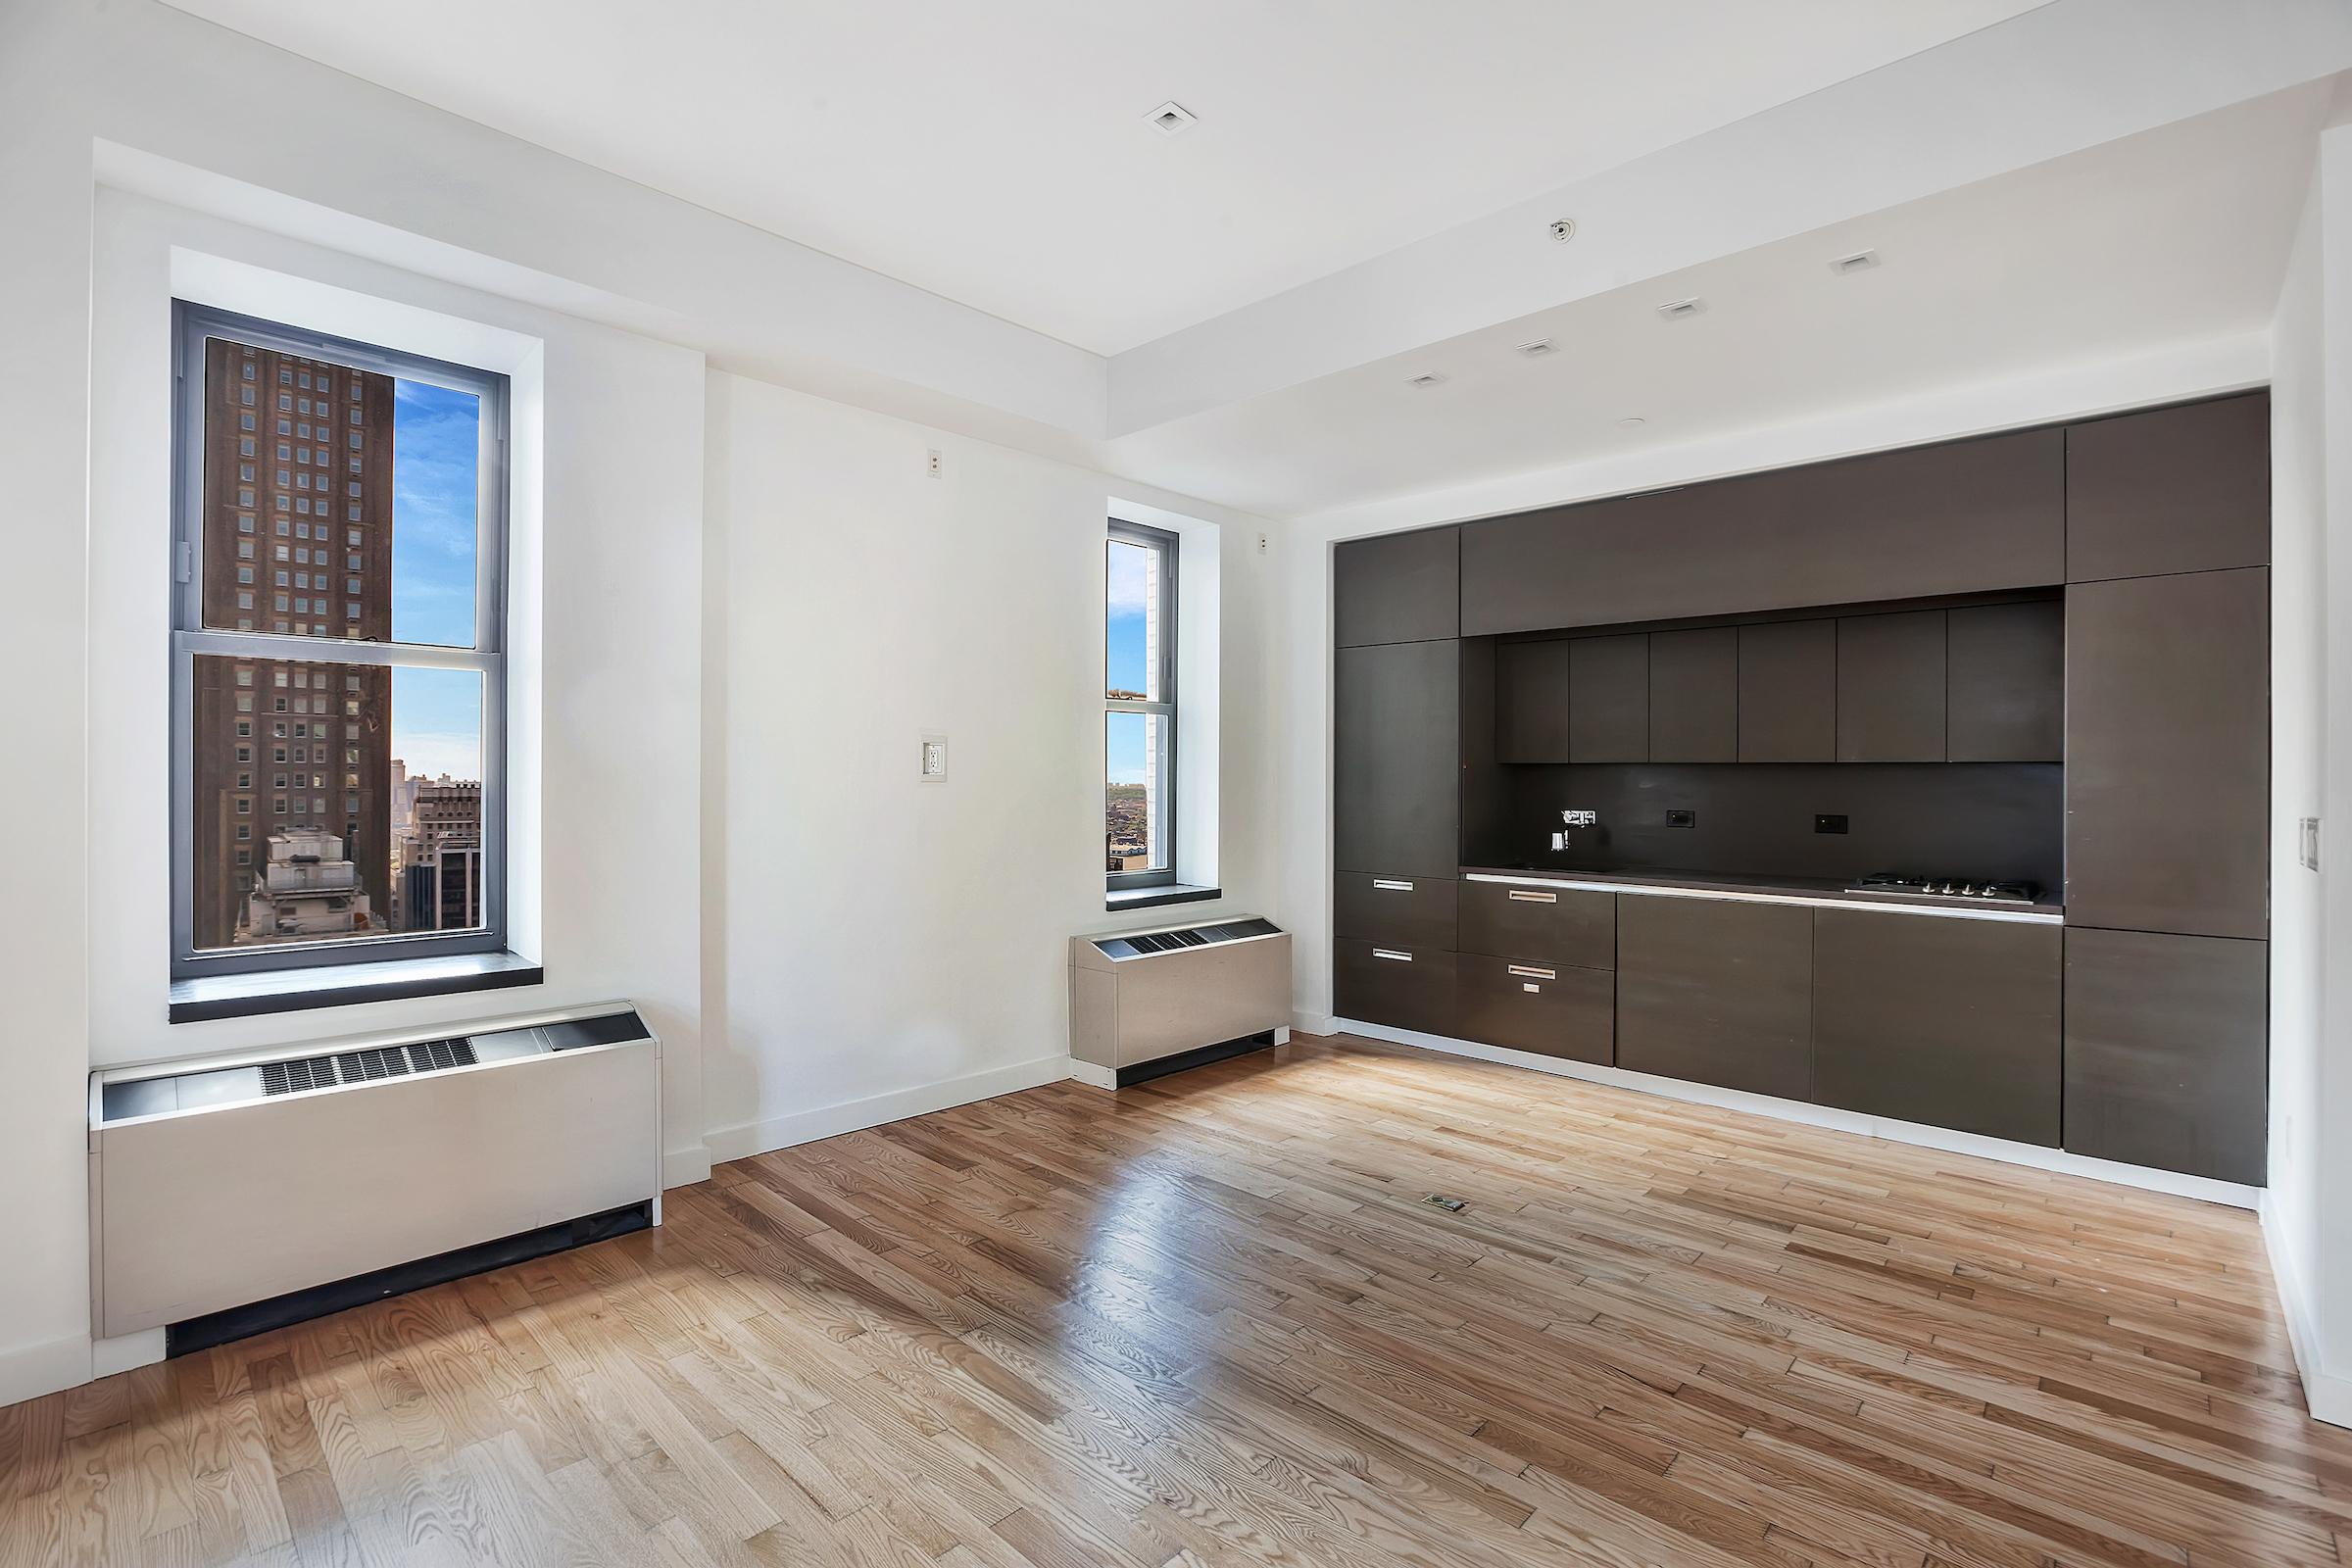 20 PINE ST PH42A, Manhattan, NY 10005